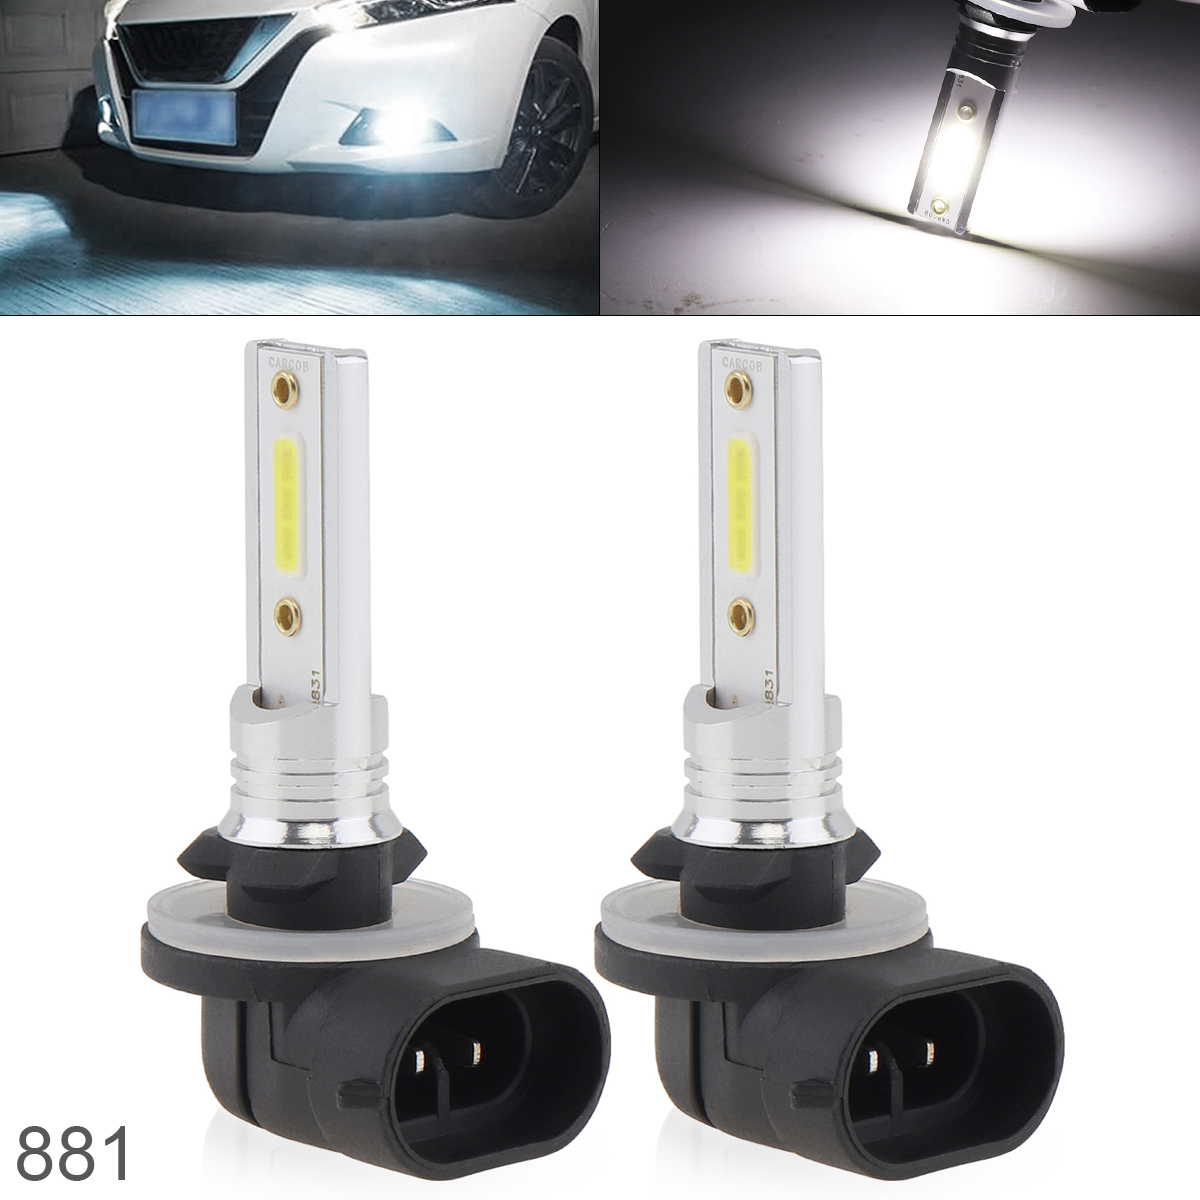 2pcs 12V 881 COB SMD Lights 1200LM 6500K 7500K White Driving Running Car Lamp Auto Light